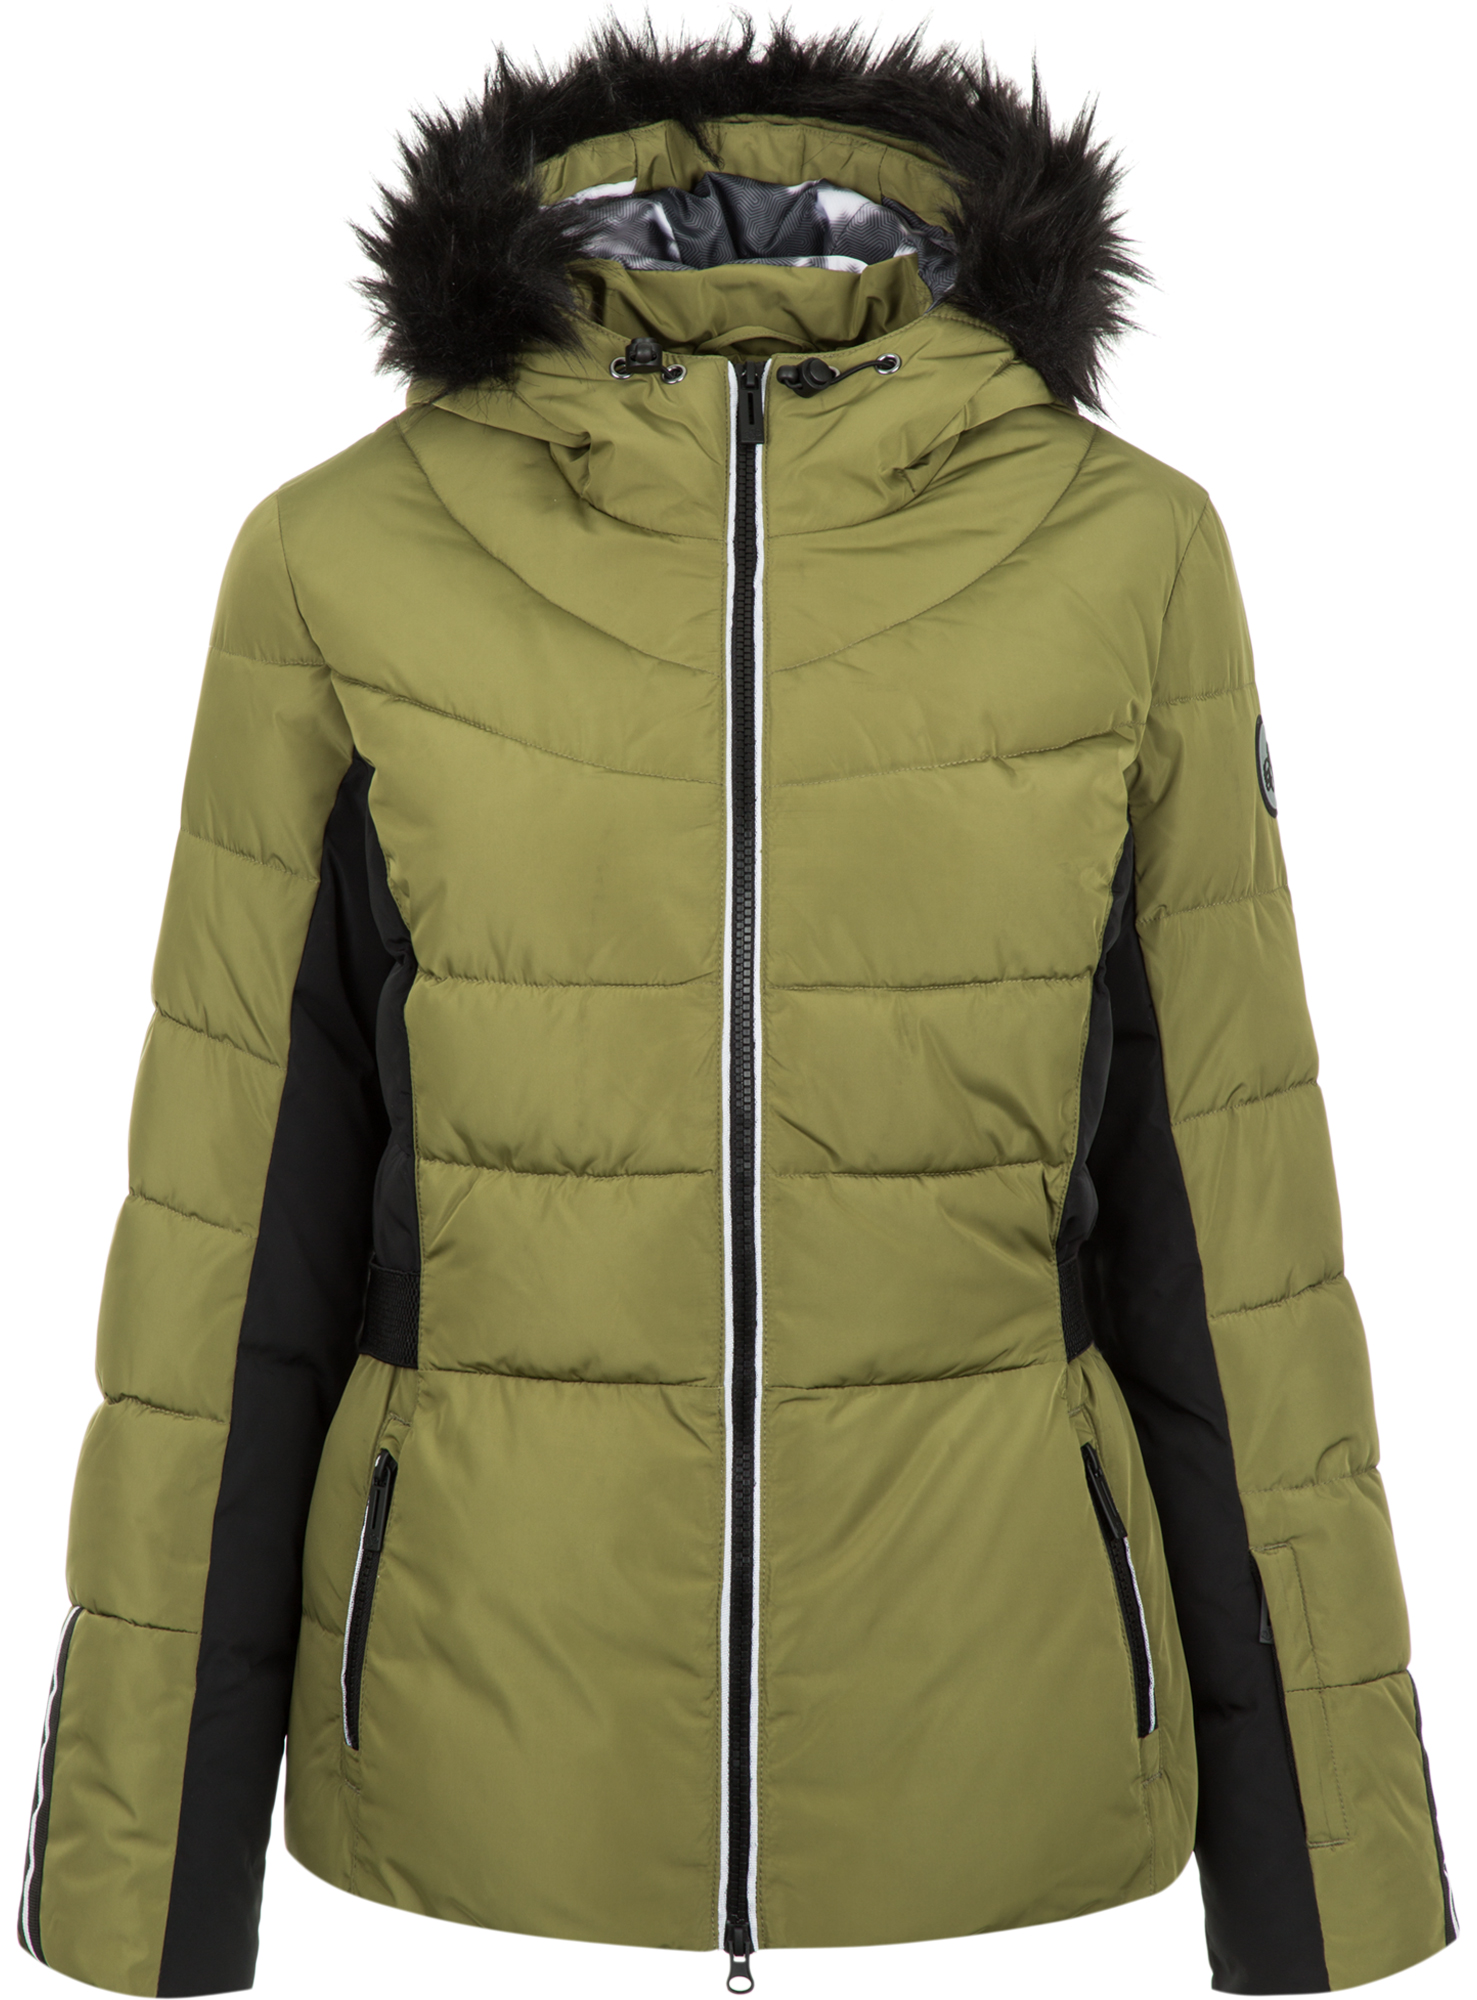 Glissade Куртка утепленная женская Glissade, размер 54 prada утепленная куртка на молнии